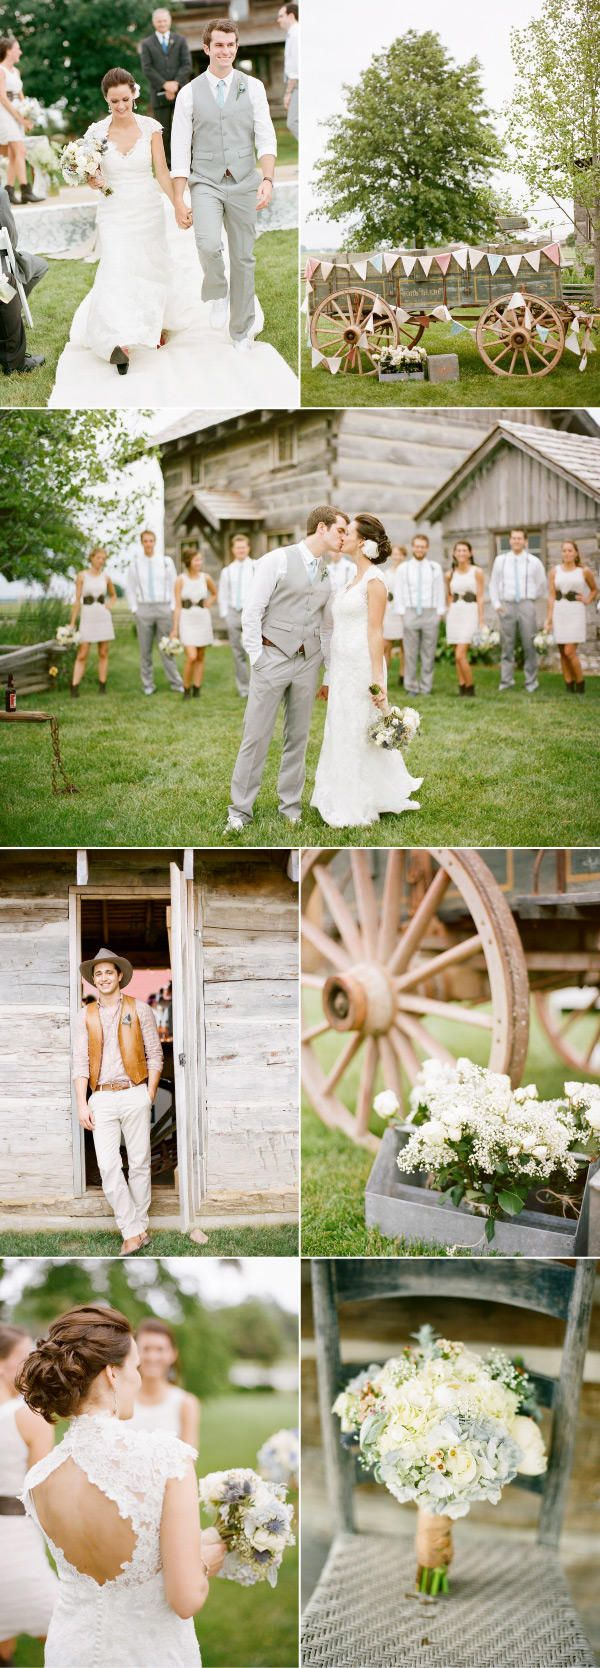 Indiana Wedding by Austin Warnock Photography   The Wedding Story